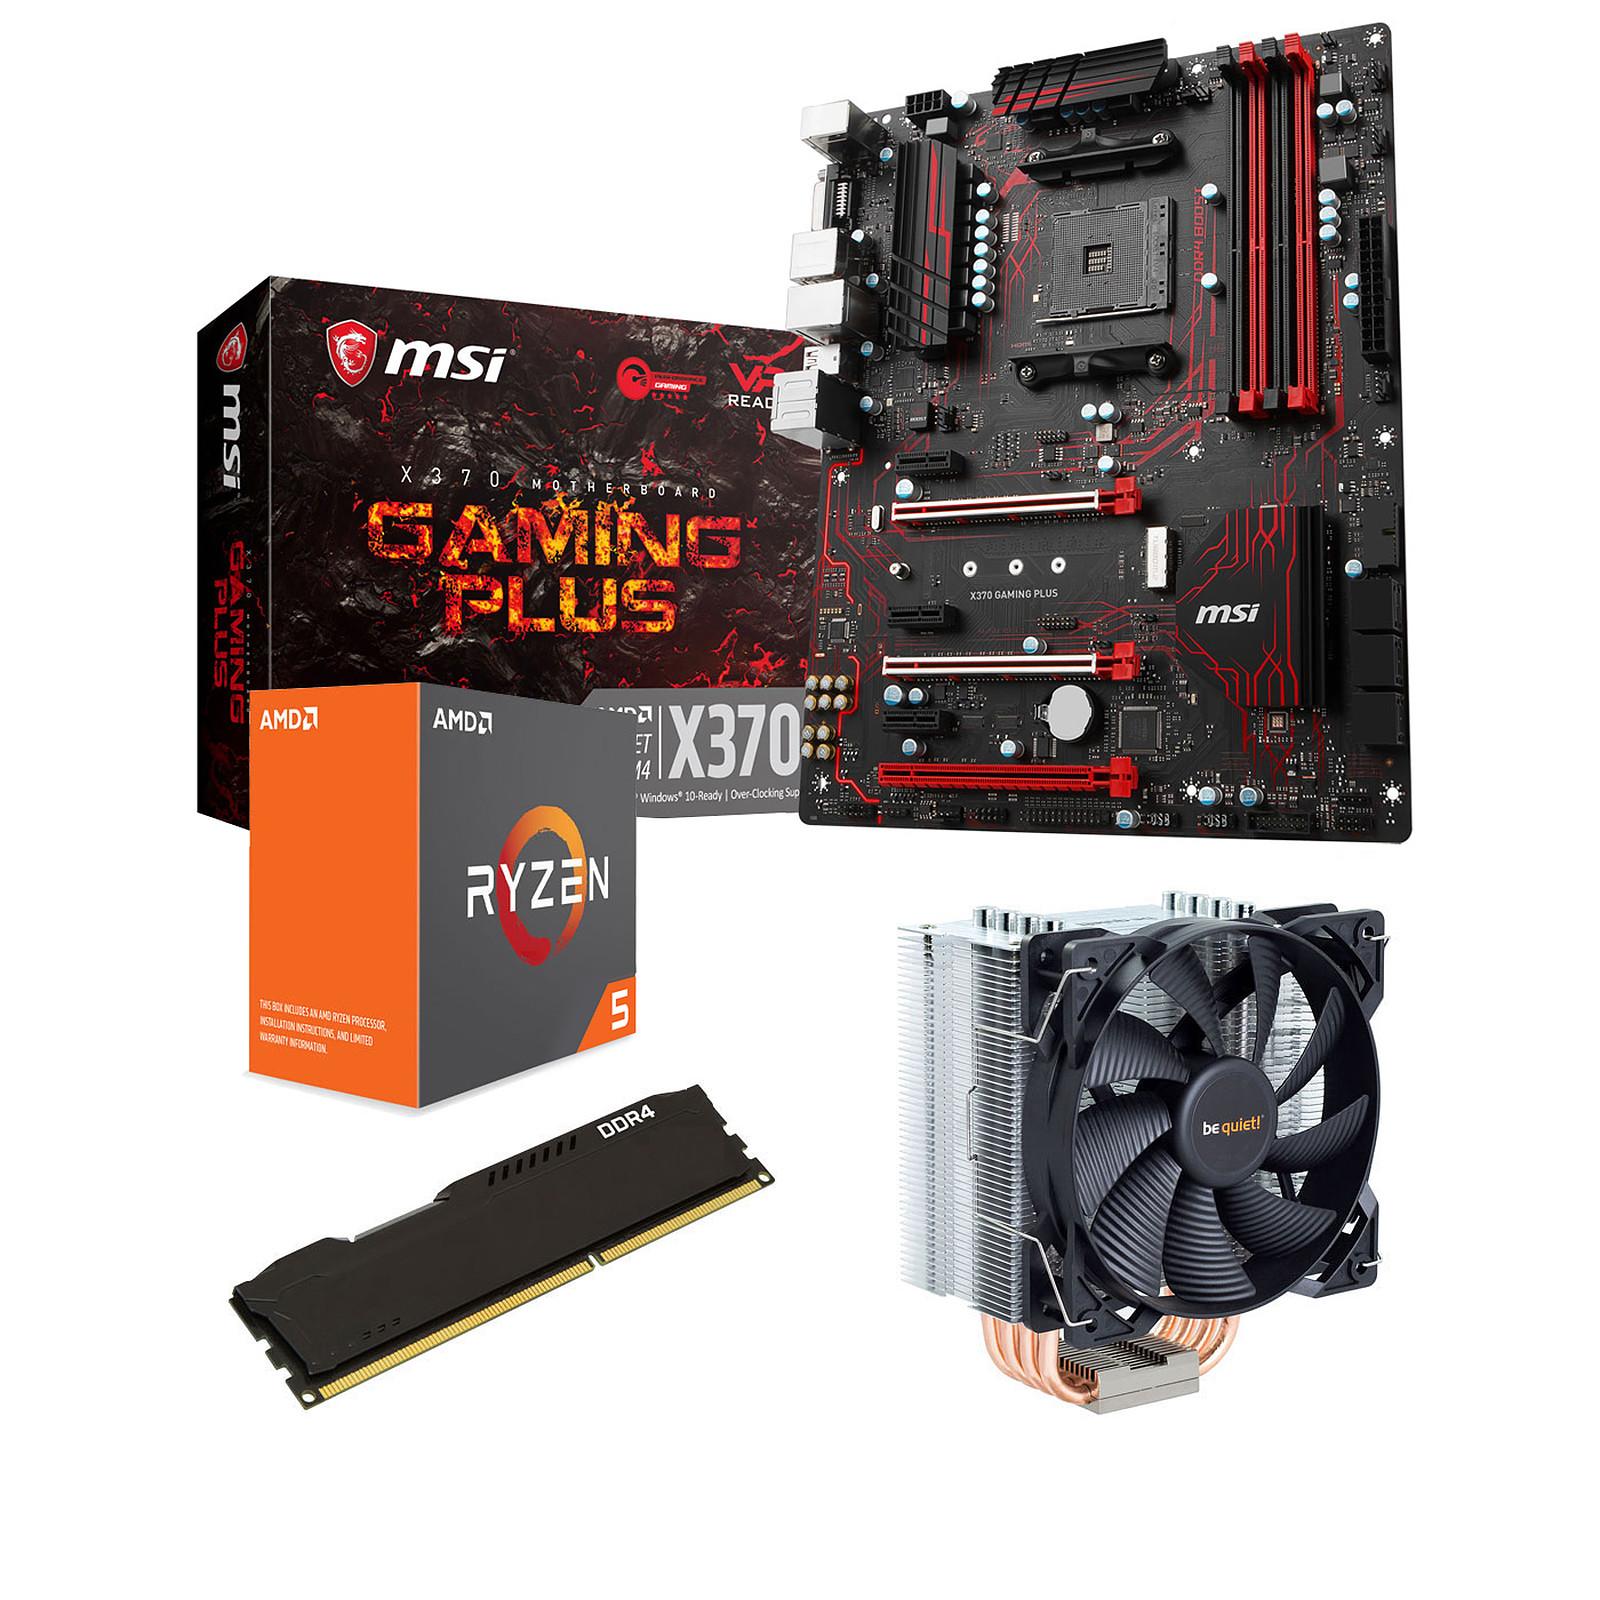 Kit Upgrade PC AMD Ryzen 5 1600X MSI X370 GAMING PLUS 8 Go